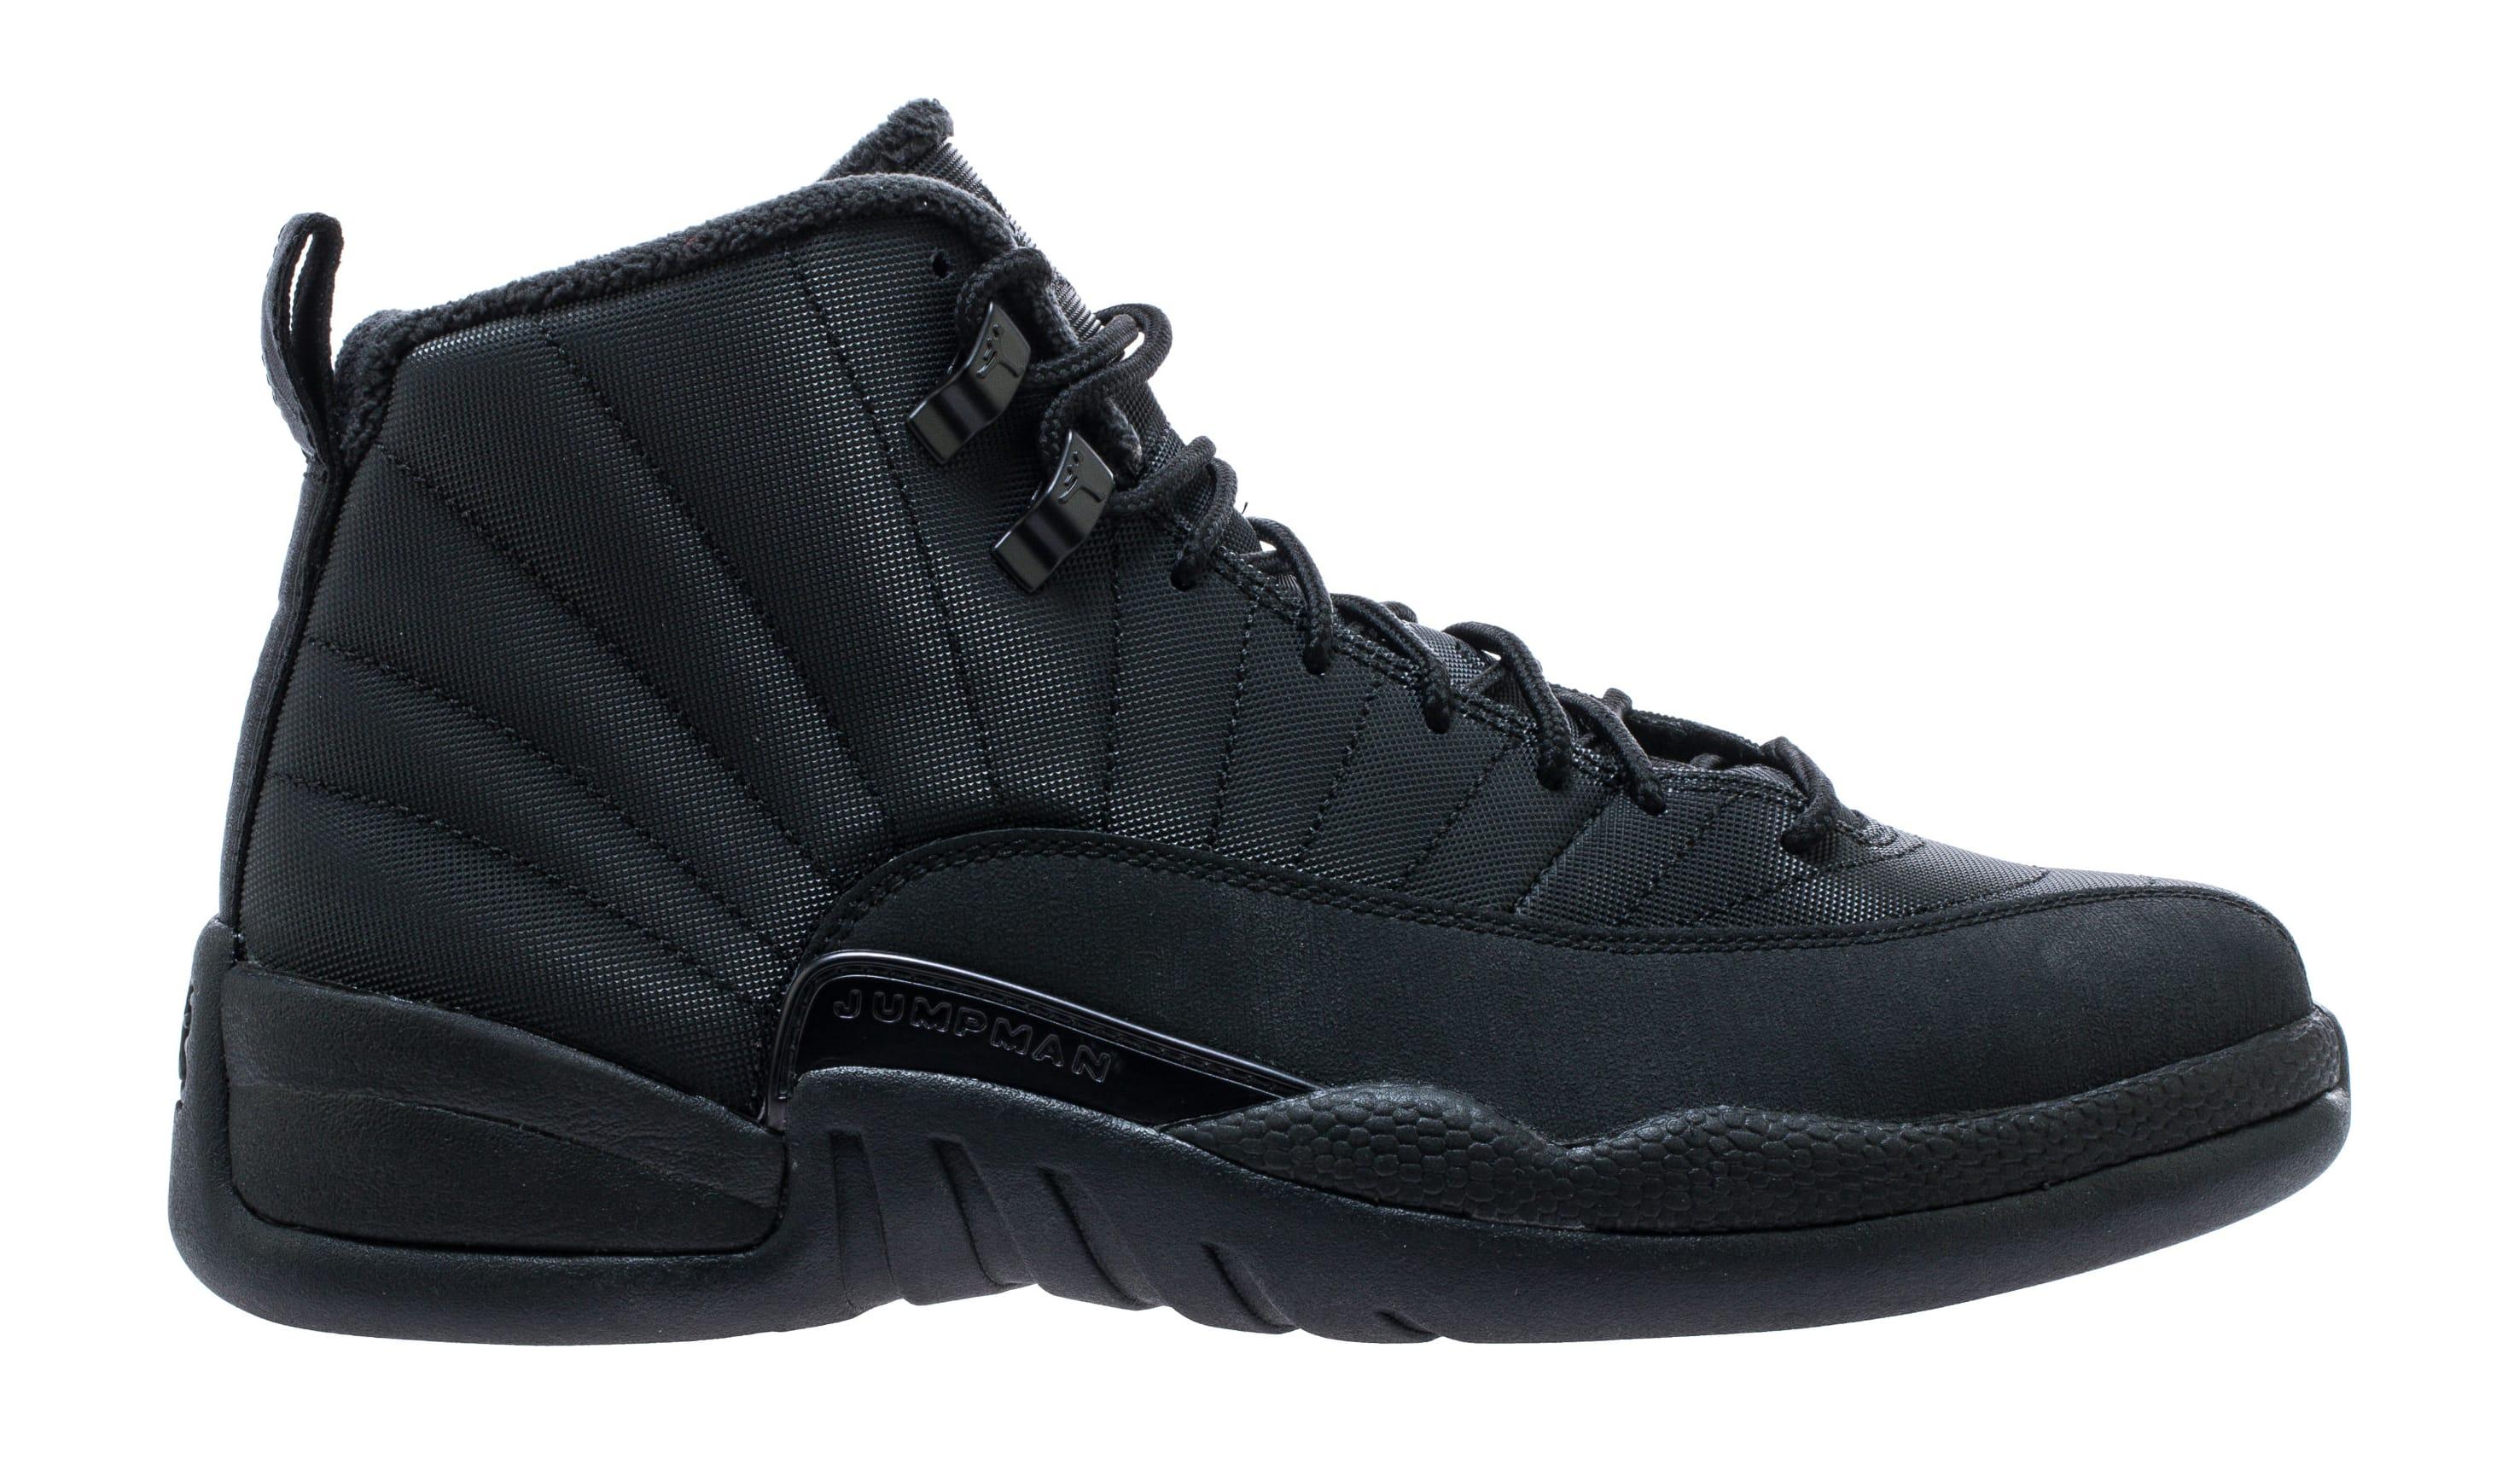 4476ff53537 Air Jordan 12 Black Winterized BQ6851-001 Release Date | Sole Collector